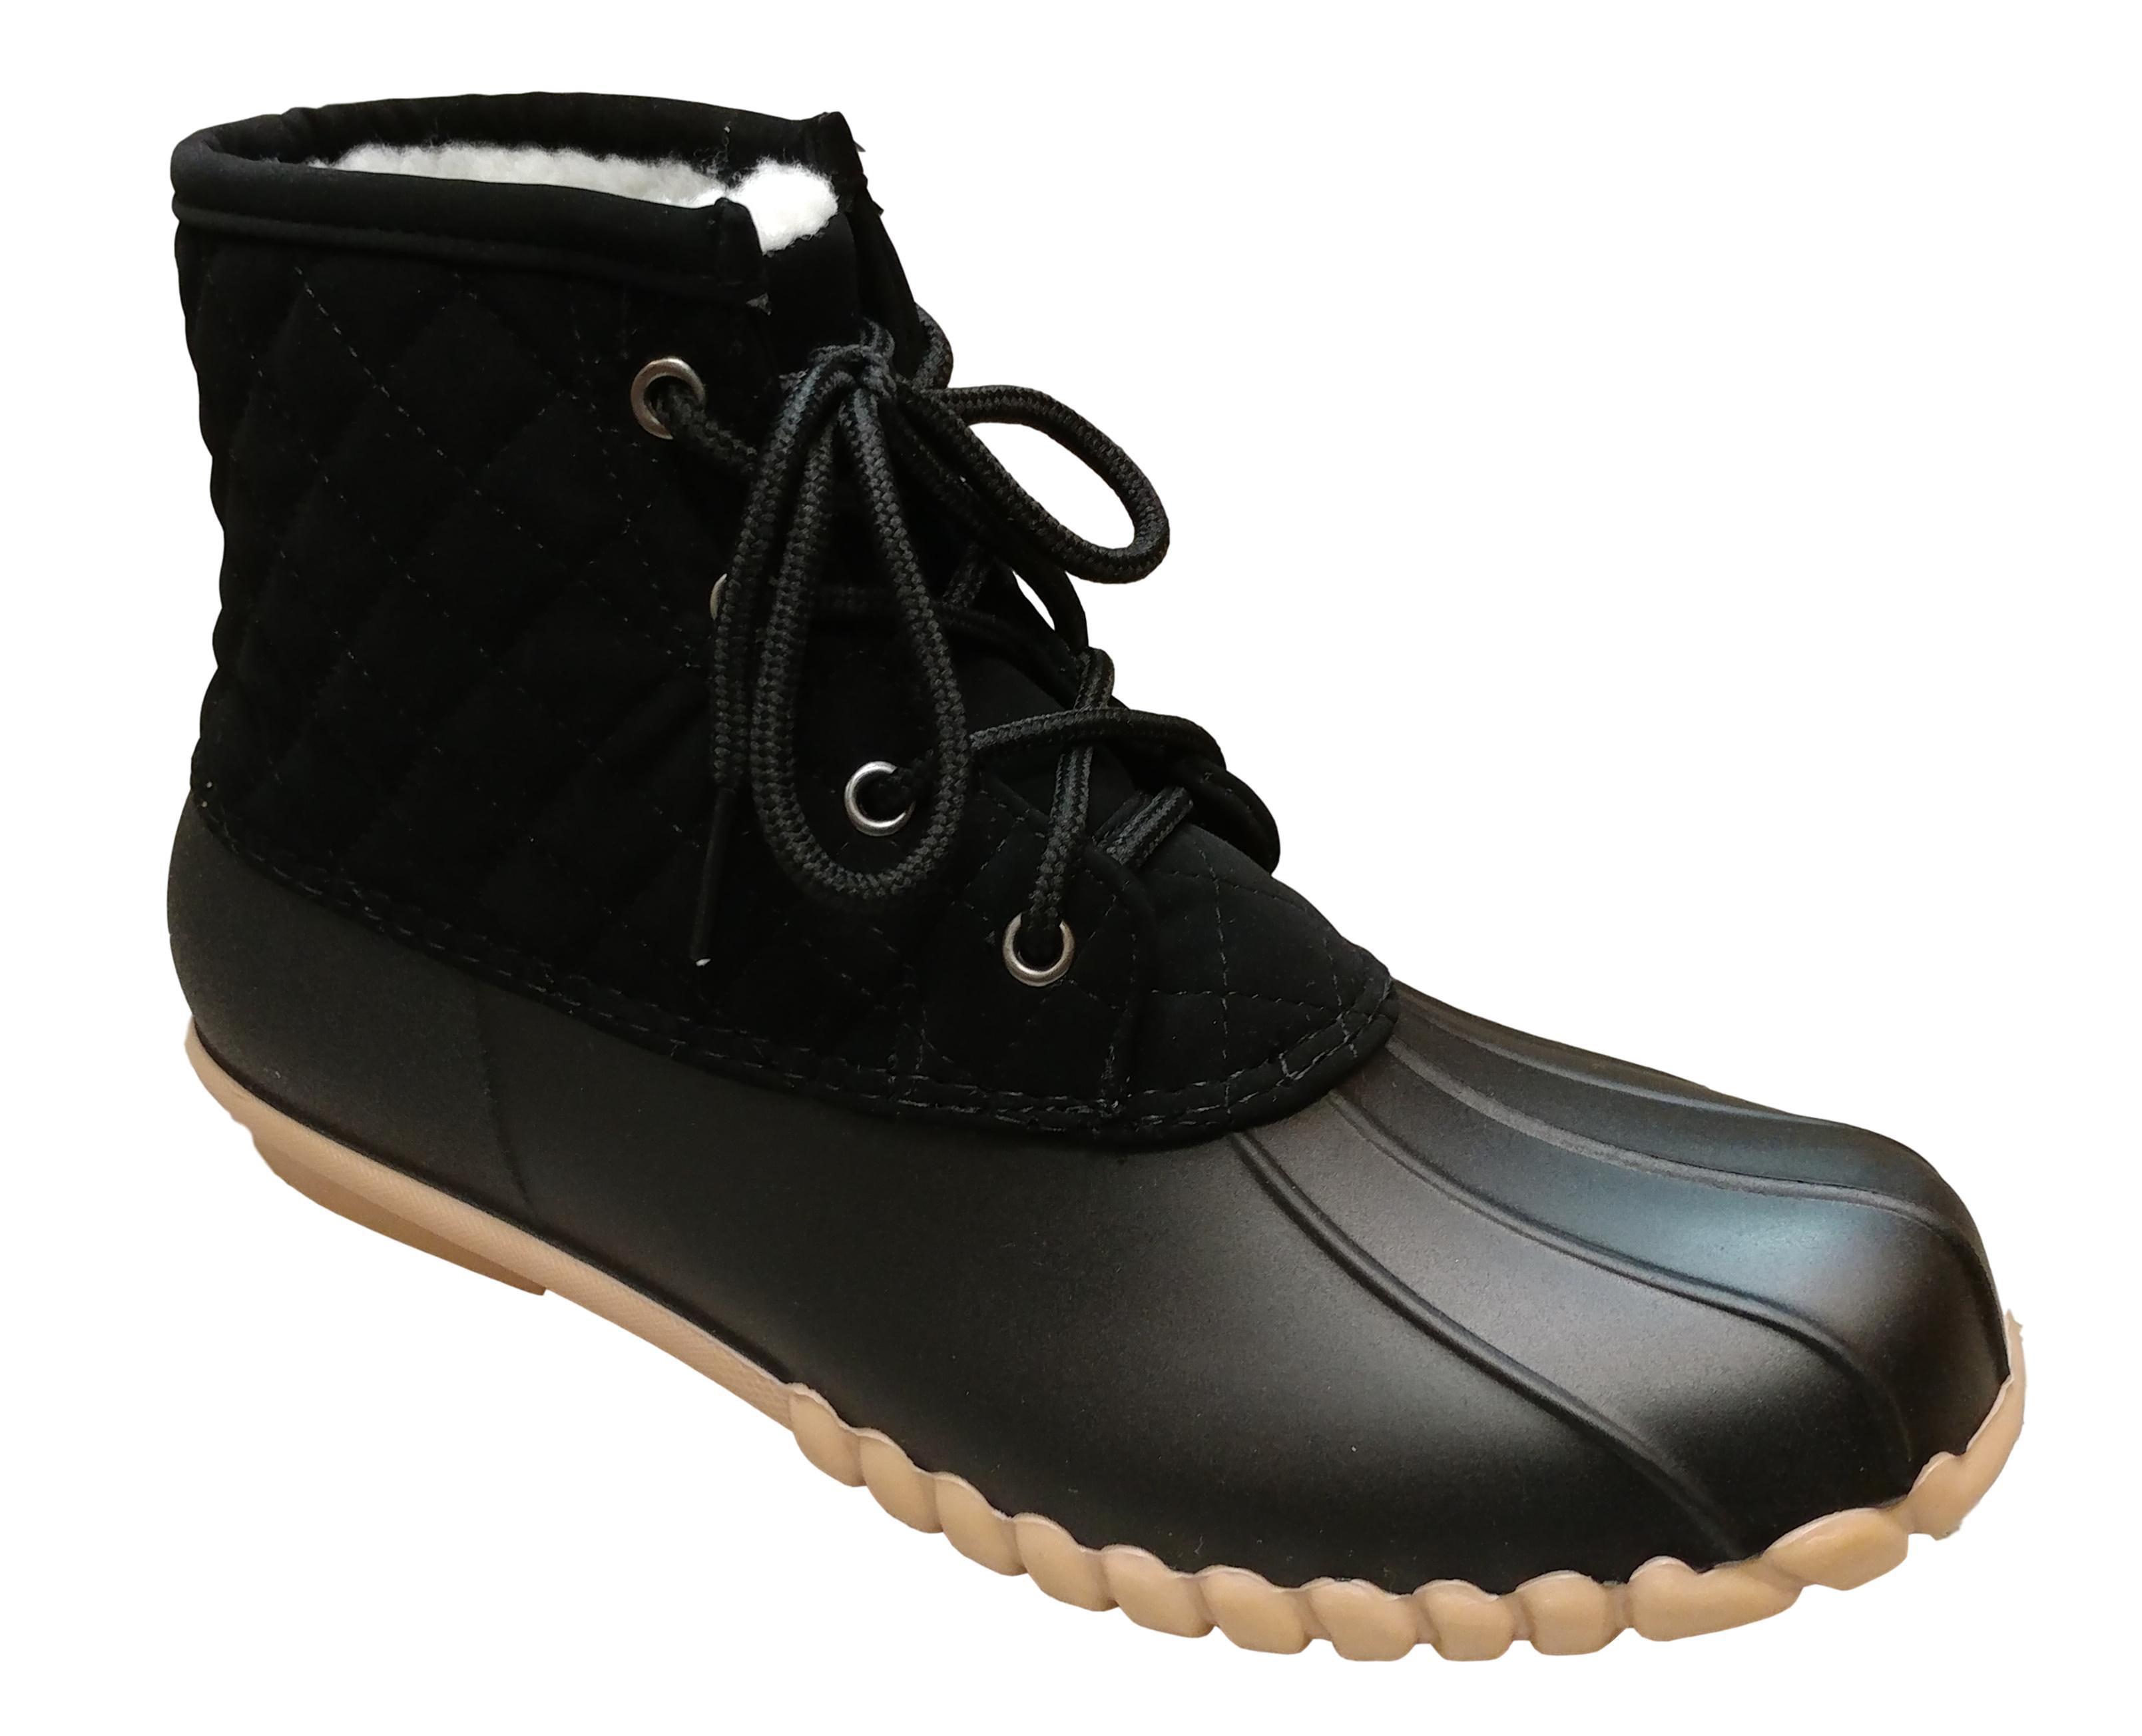 Olem - Outwoods Women's Autumn 12 Black Nubuck Ankle High Duck Boot with  Faux Fur Lining Size: 8, Width: Medium - Walmart.com